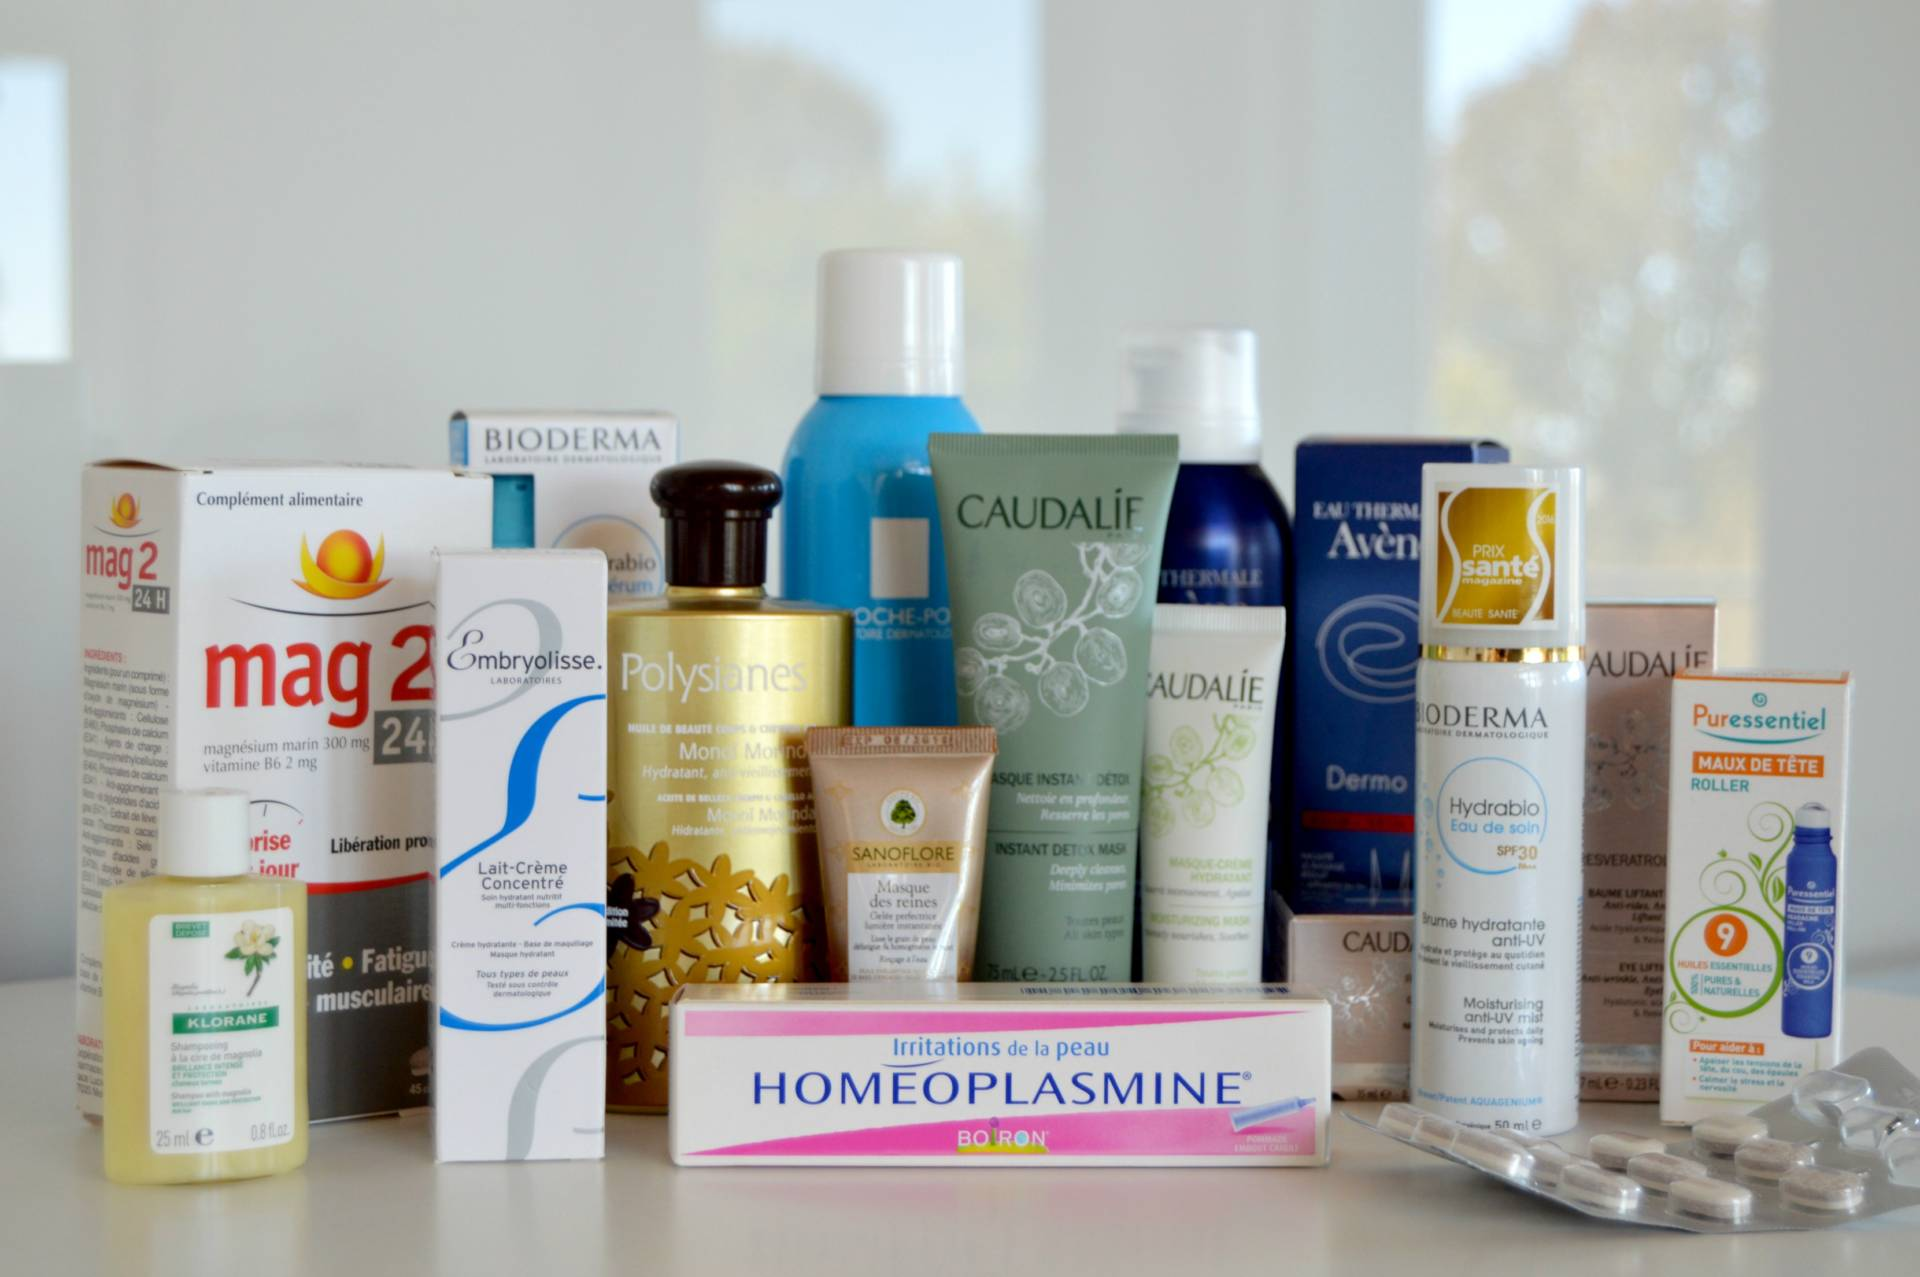 french-pharmacy-farmacie-haul-inhautepursuit-paris-travel-blogger